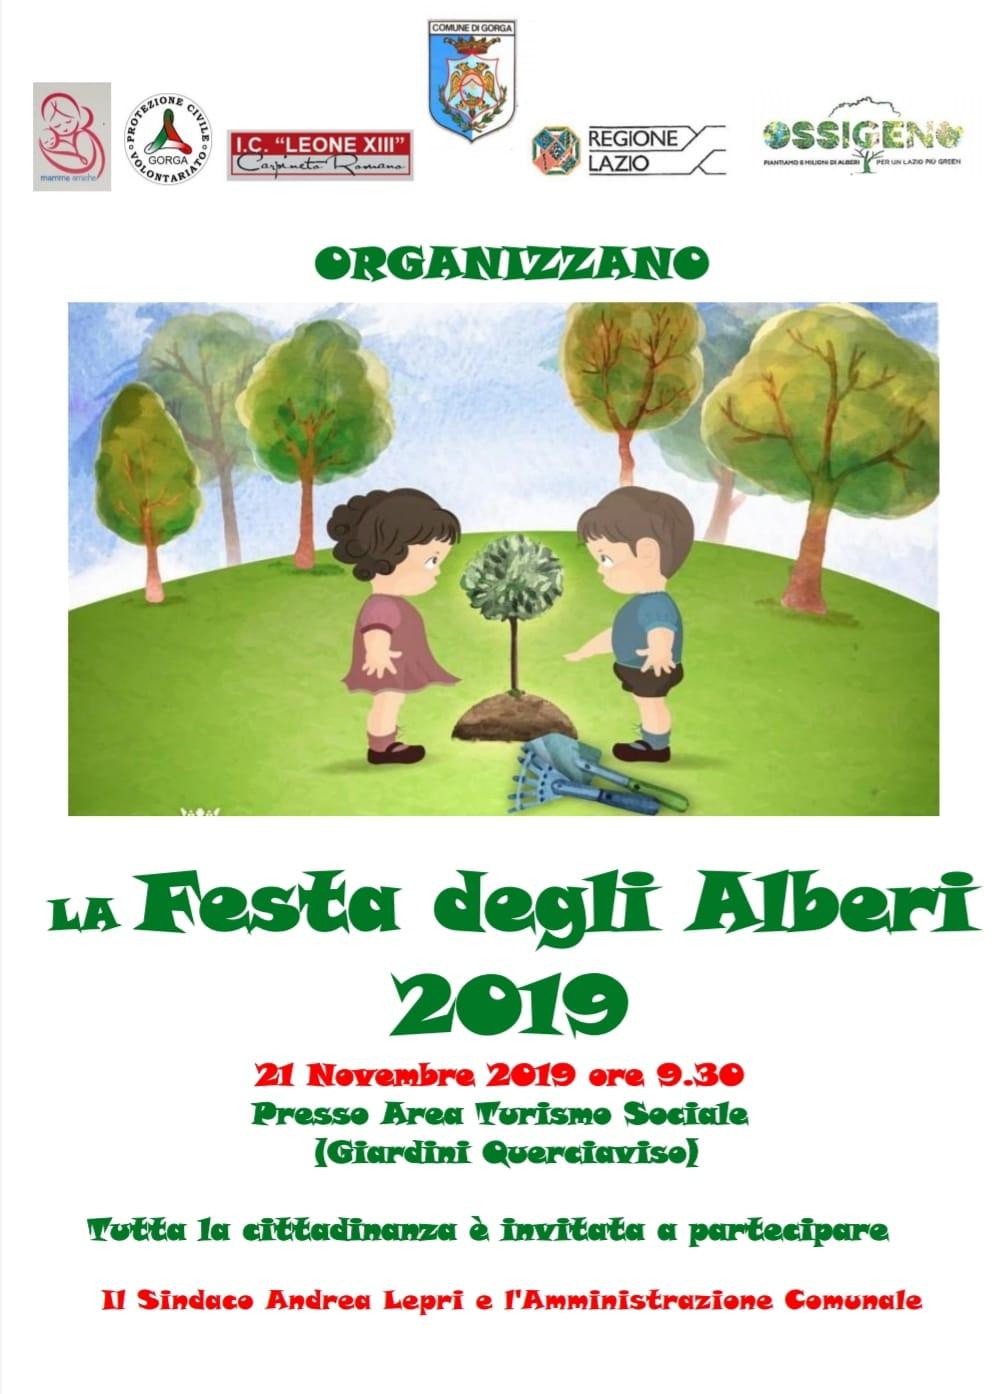 Gorga: Festa degli alberi @ area turismo sociale   Gorga   Lazio   Italia